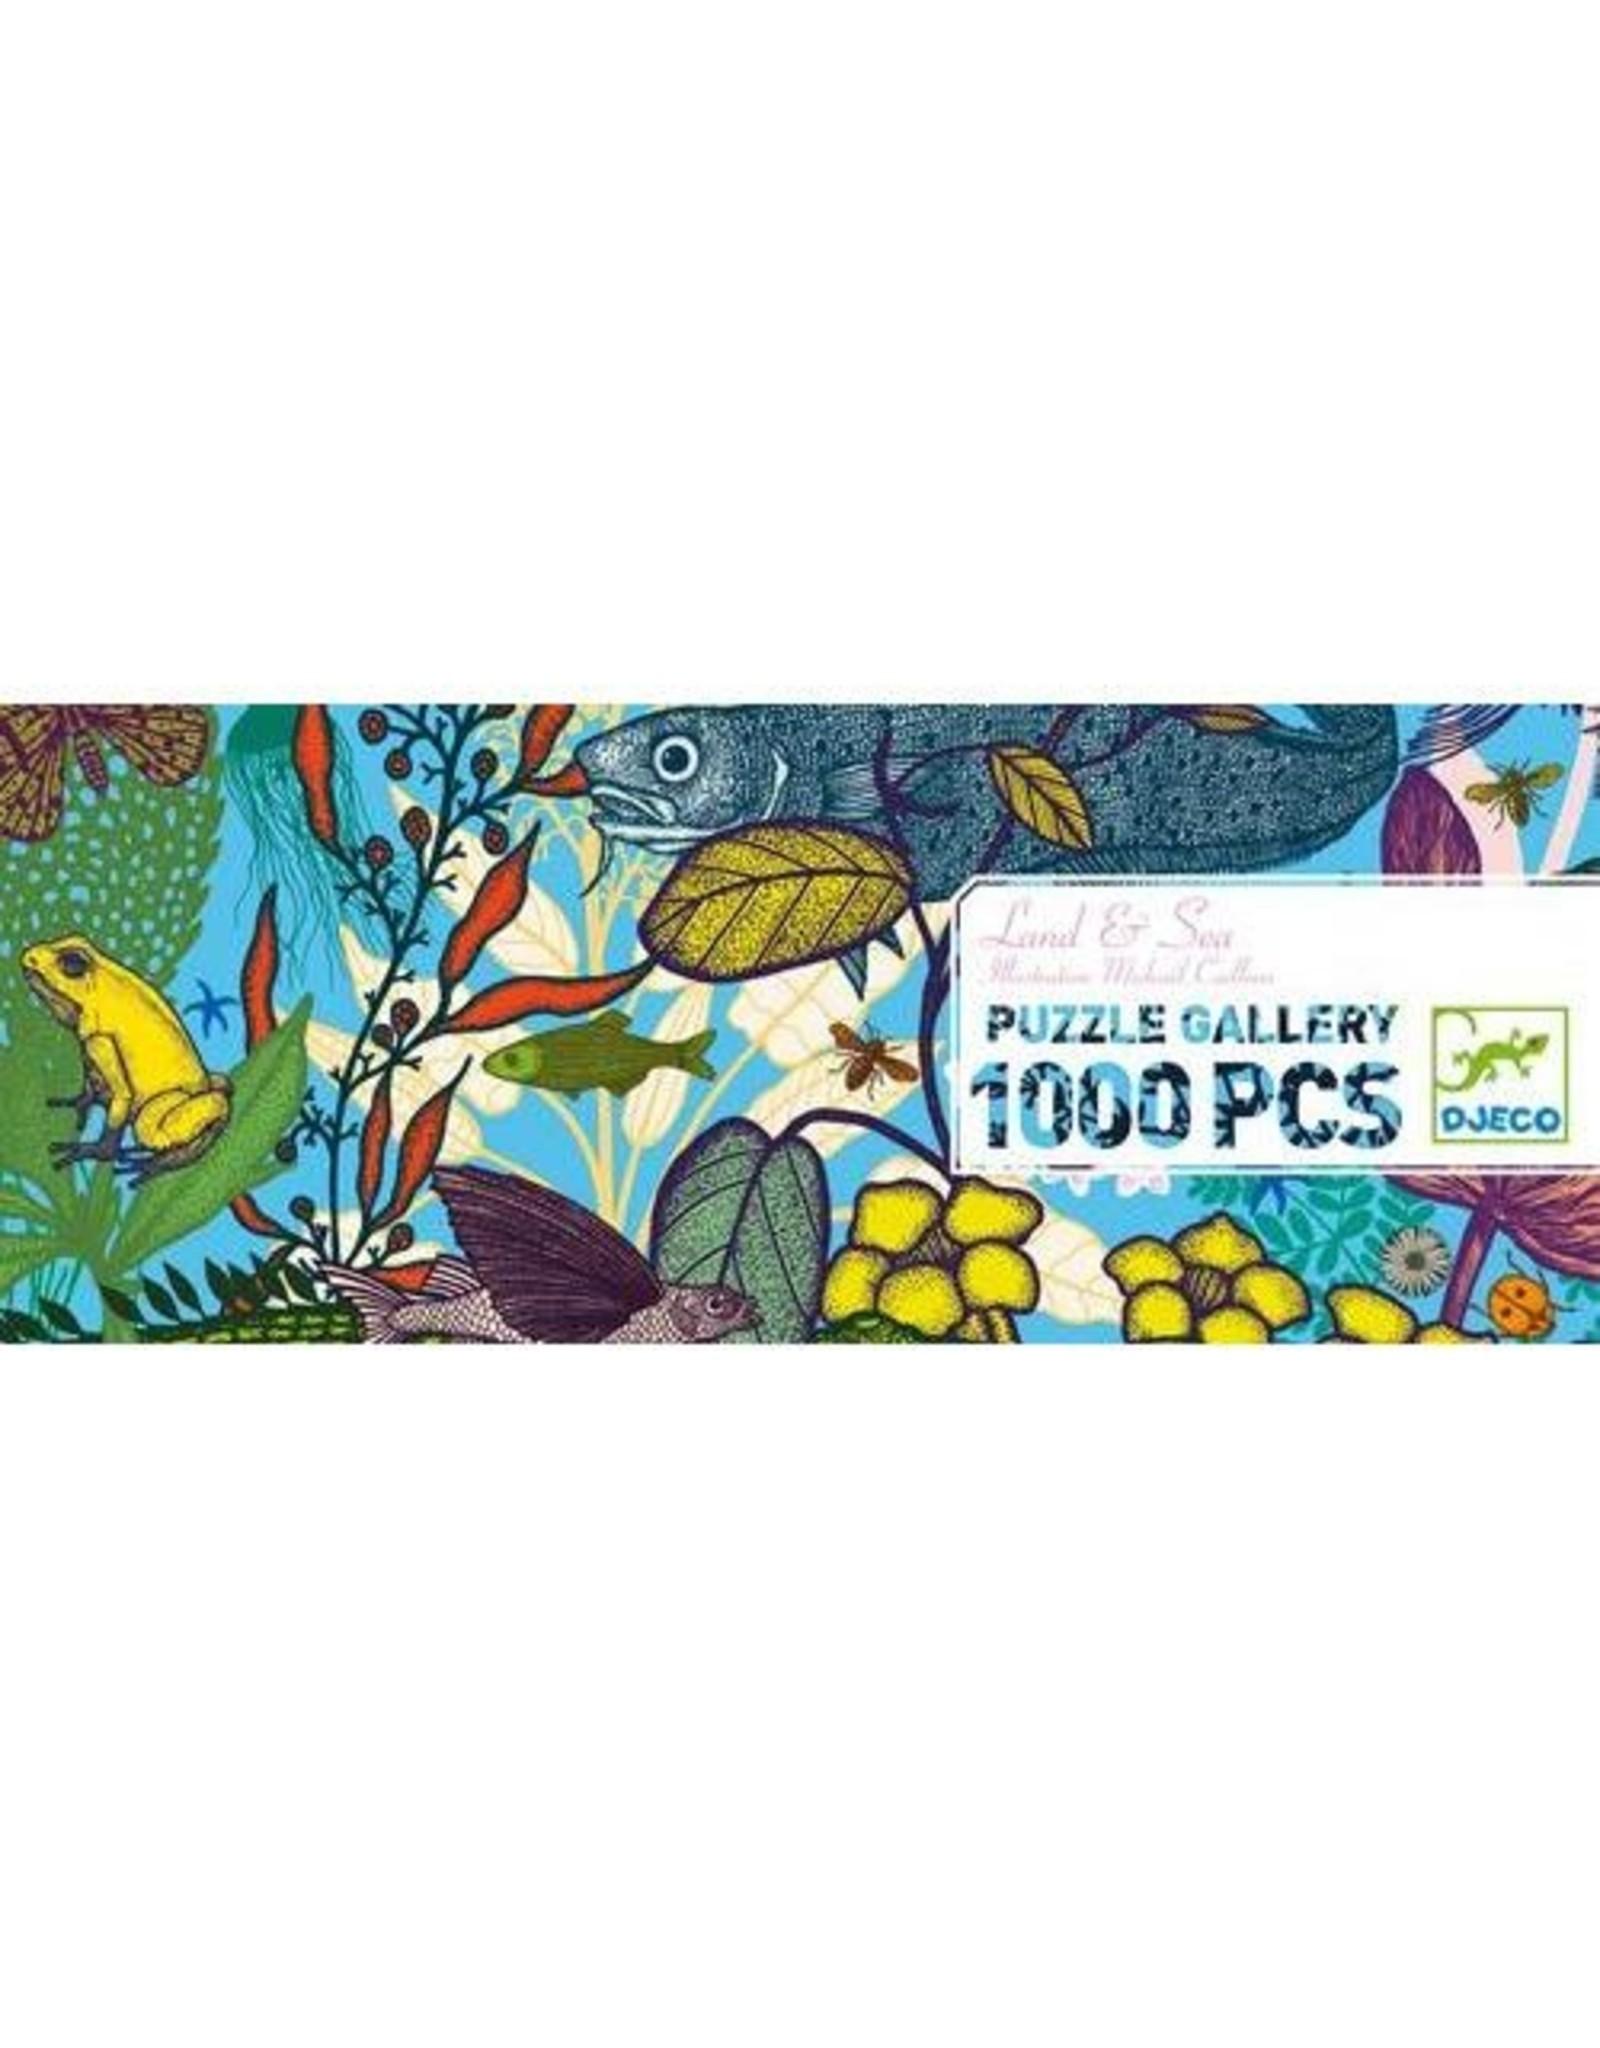 Djeco Land & Sea Gallery Puzzle 1000pcs